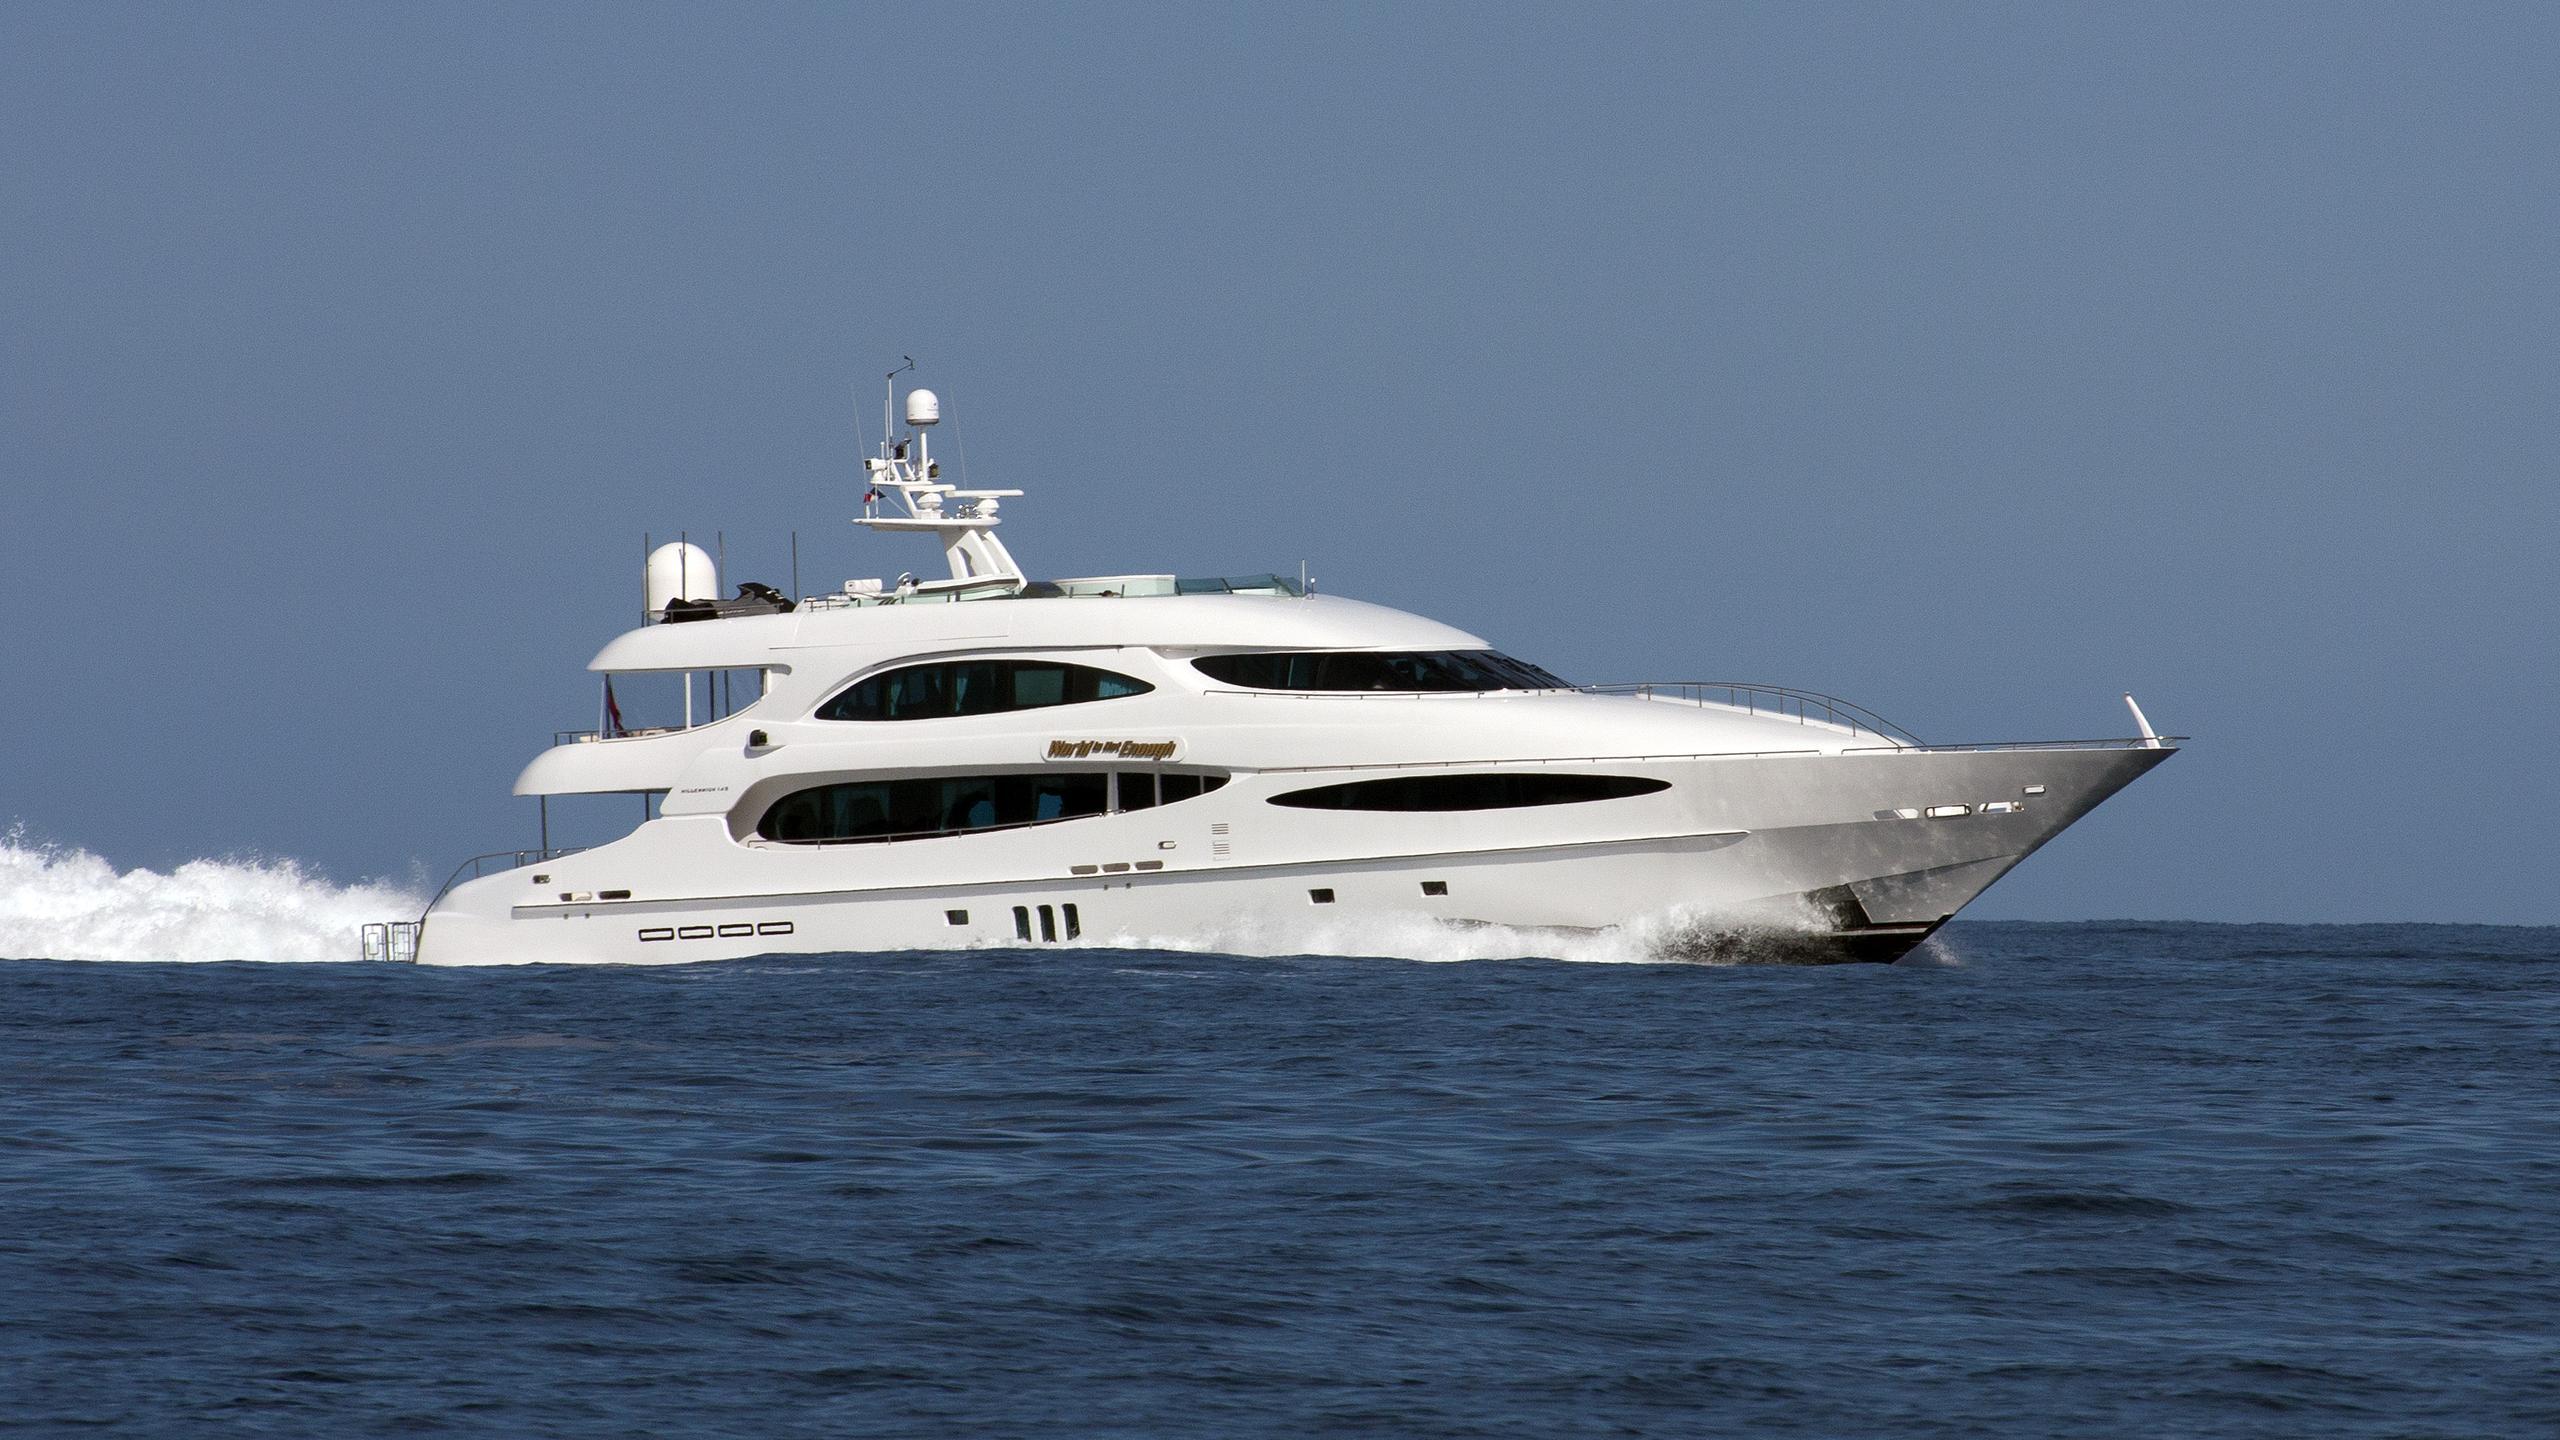 world-is-not-enough-motor-yacht-neptunus-millenium-140-2004-42m-profile-cruising